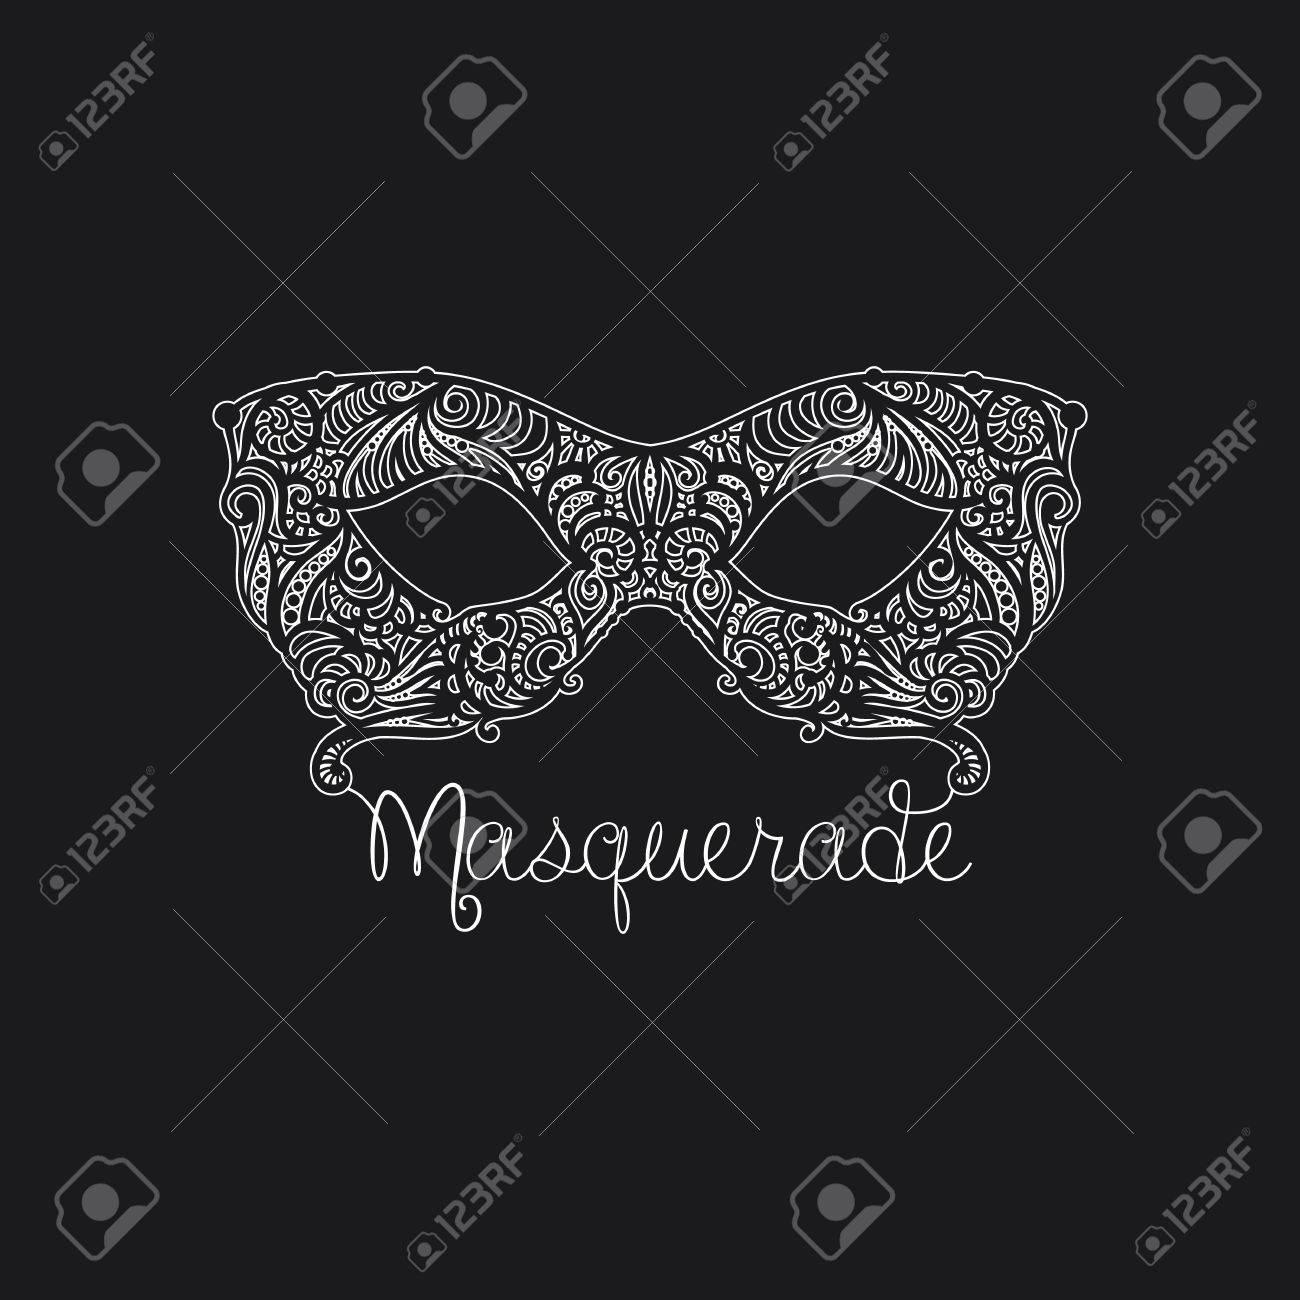 Monochrome Vector Masquerade Mask. Design Element For Cards ...